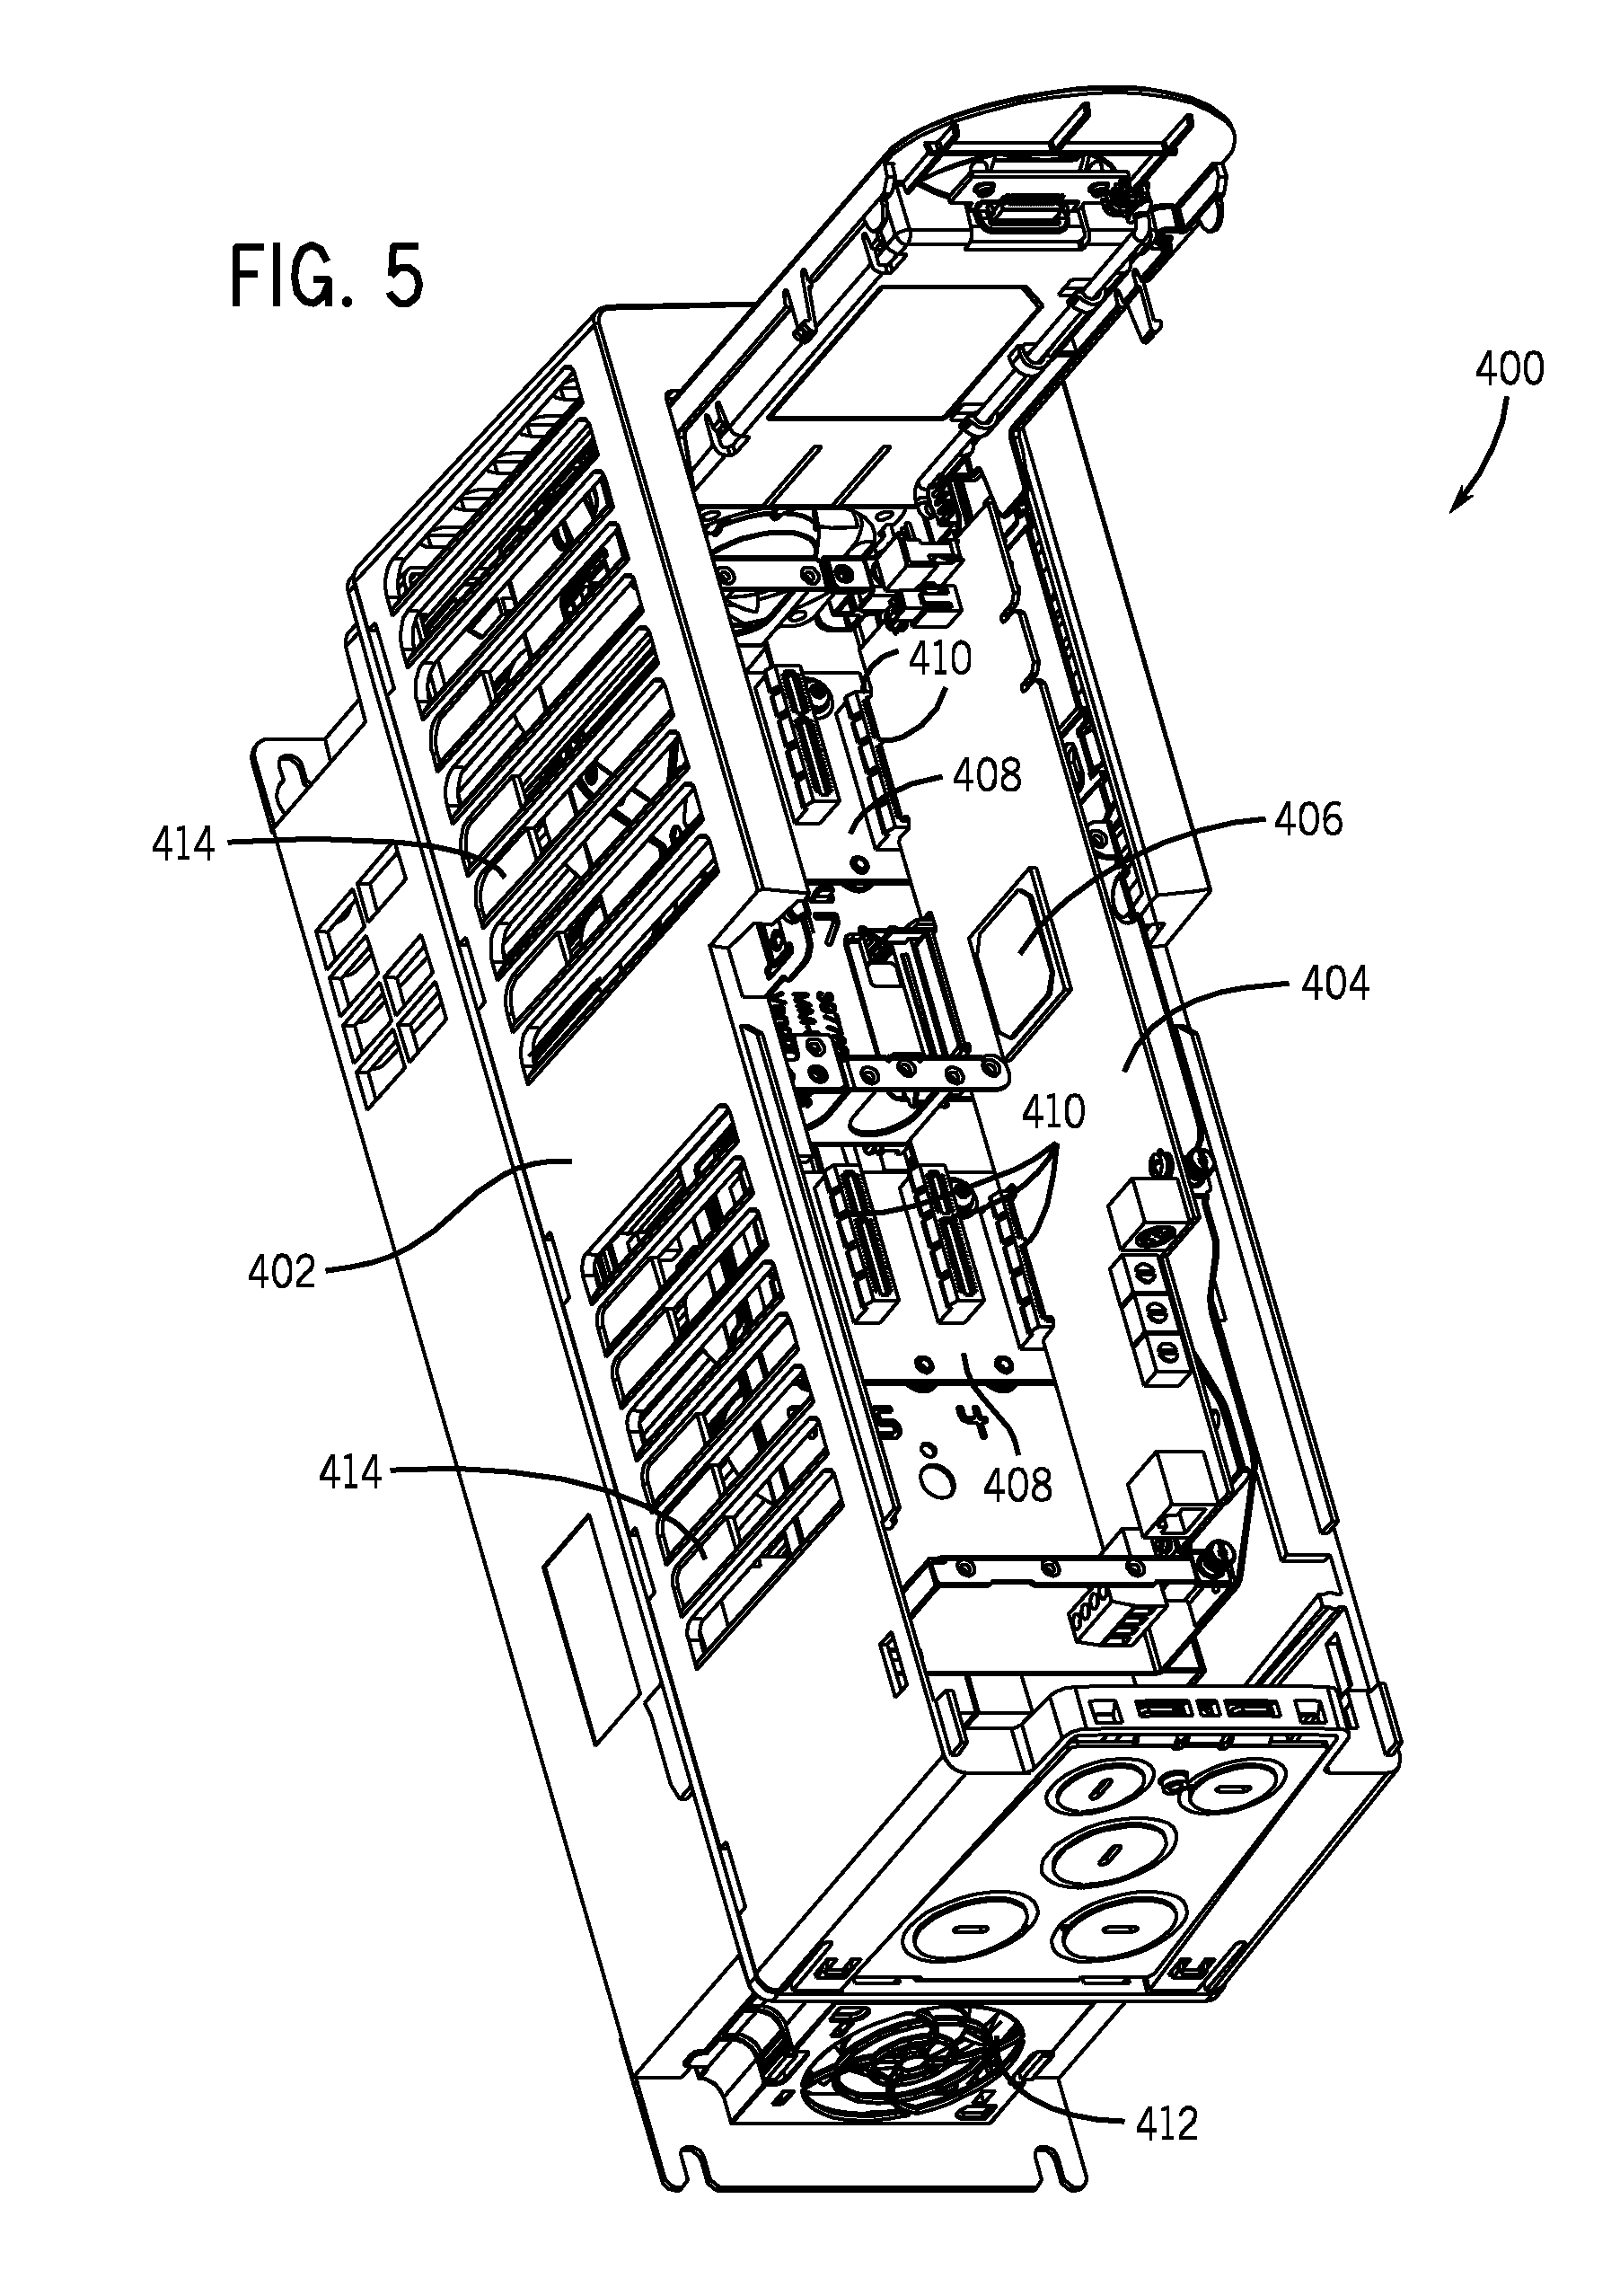 Powerflex 753 Wiring Diagram Ethernet - Auto Electrical